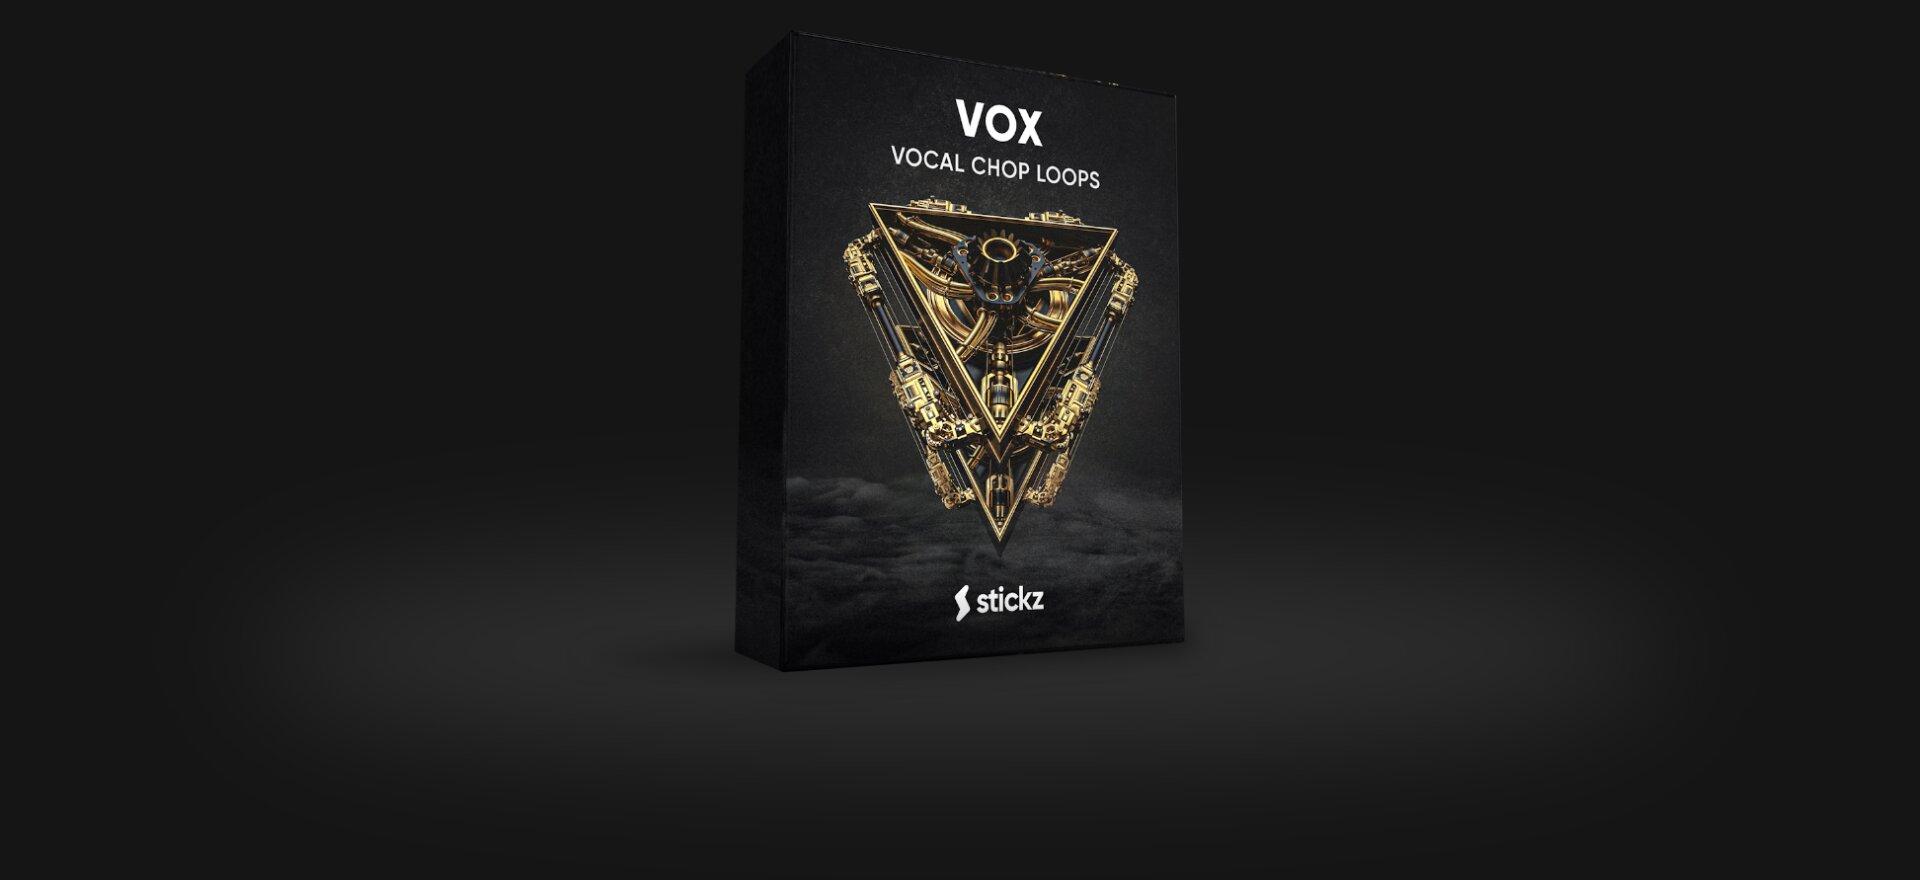 VOX - Product Box Shot